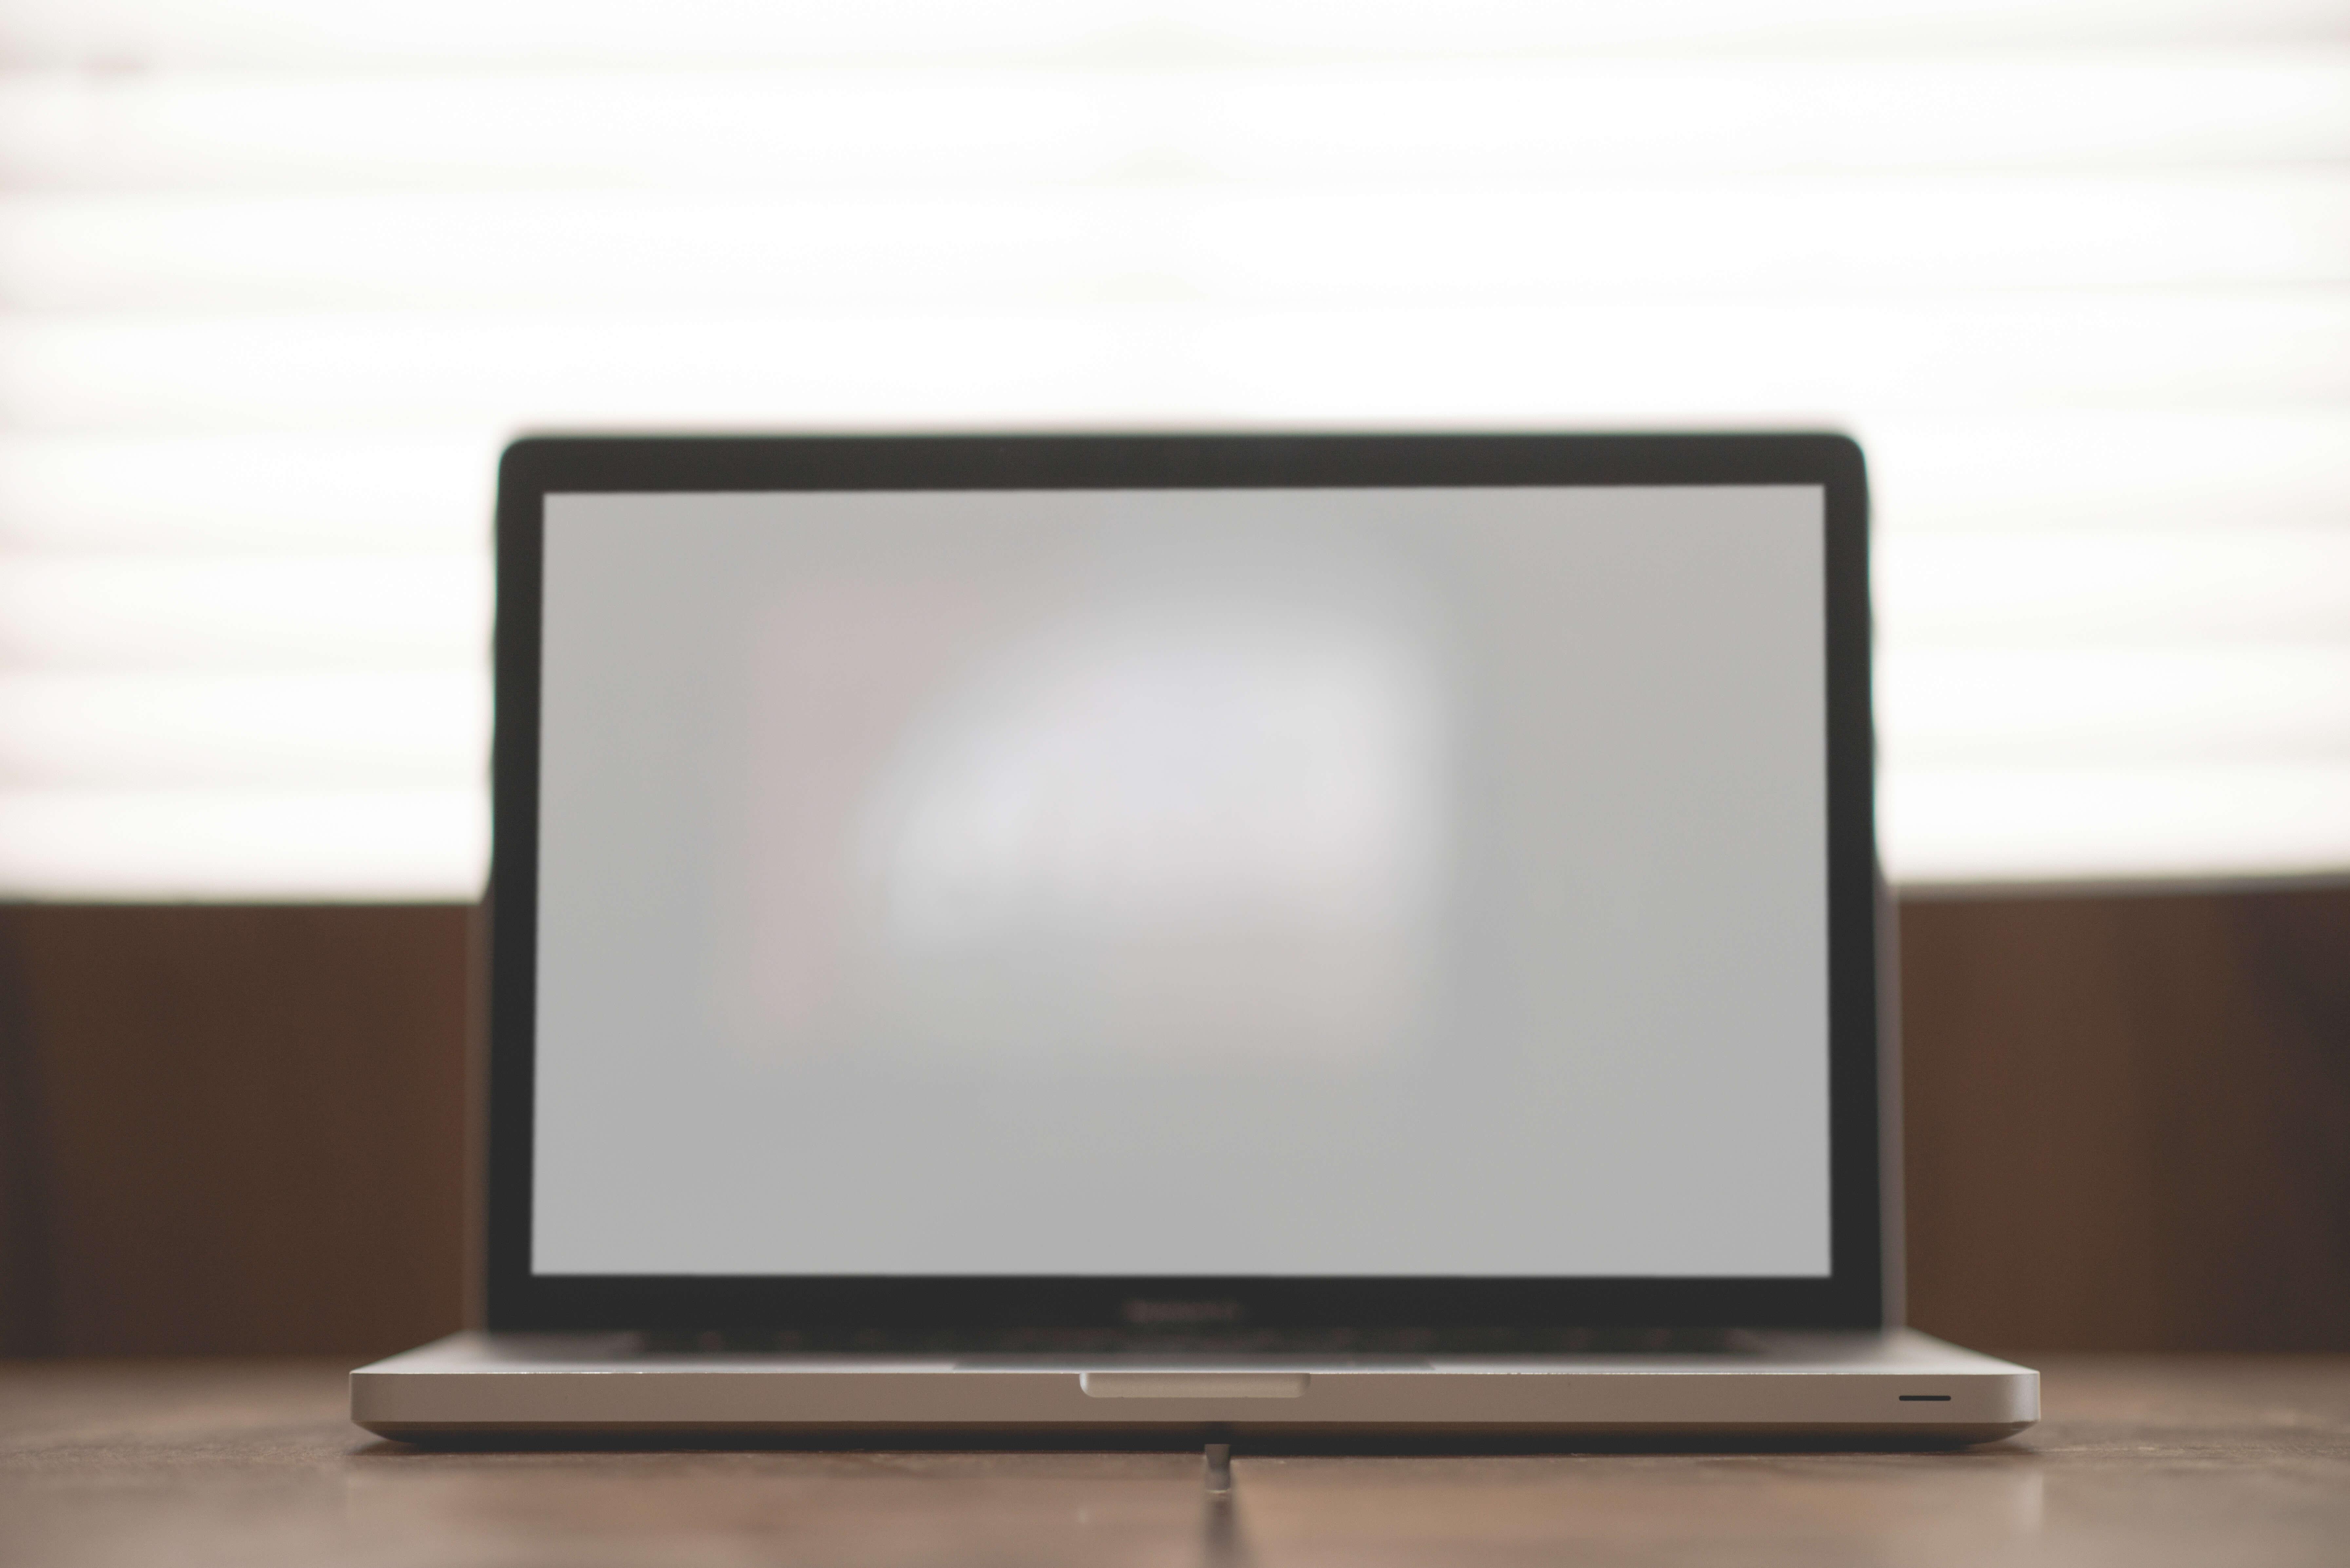 apple-computer-desk-6568